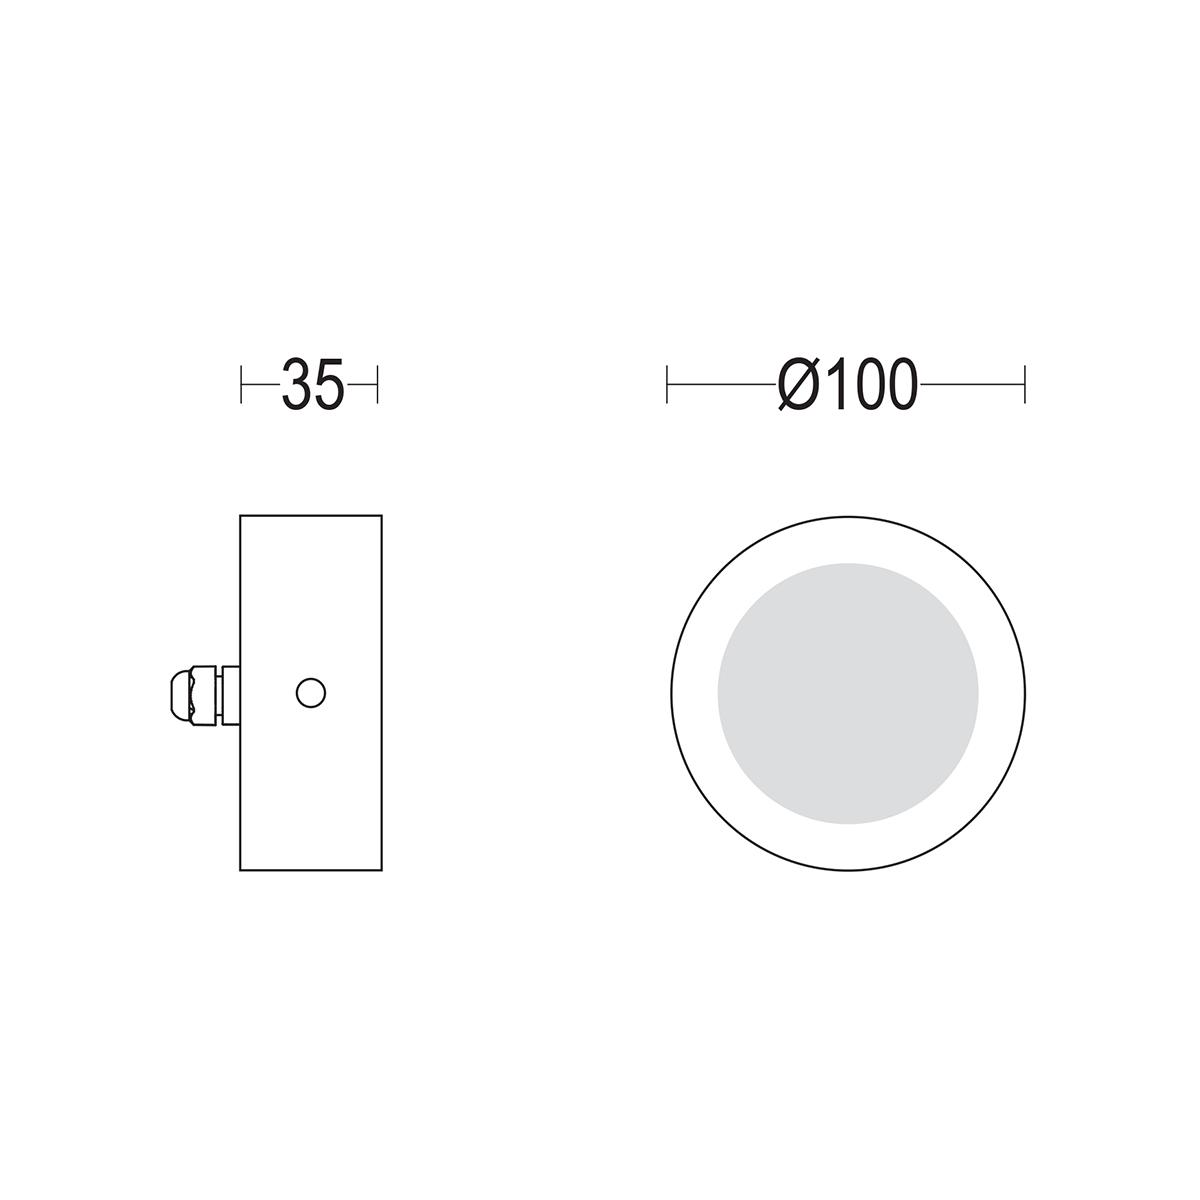 чертеж Microspia flat 100 Ghidini уличный светильник GH1385.CAXO300EN